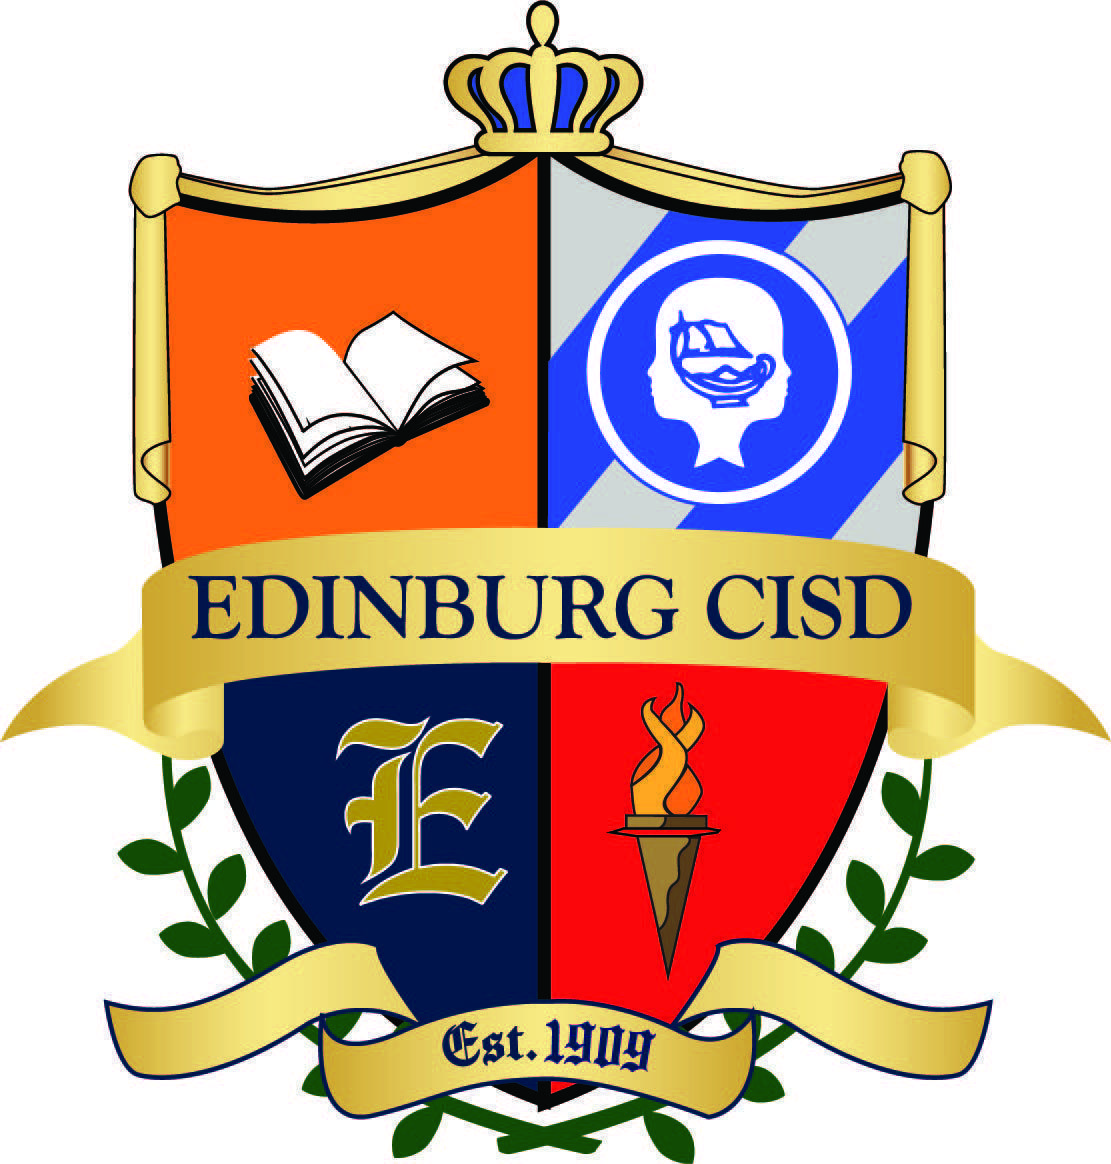 Image of ECISD logo